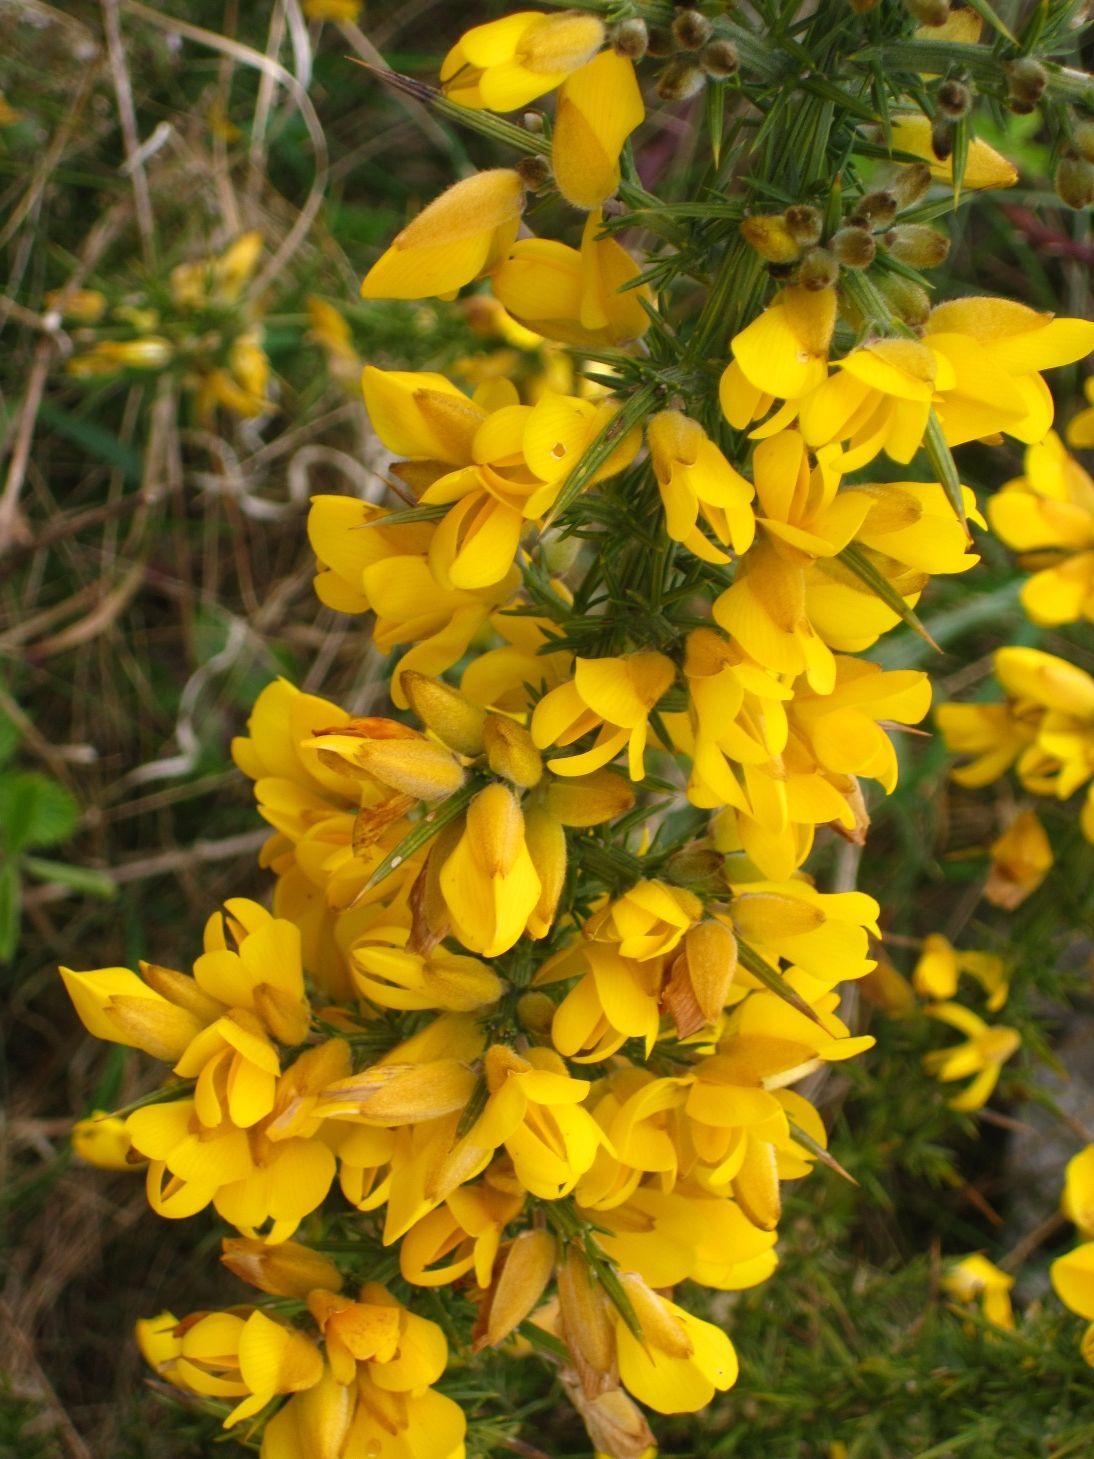 Yellow Flower Spiky Bush 4